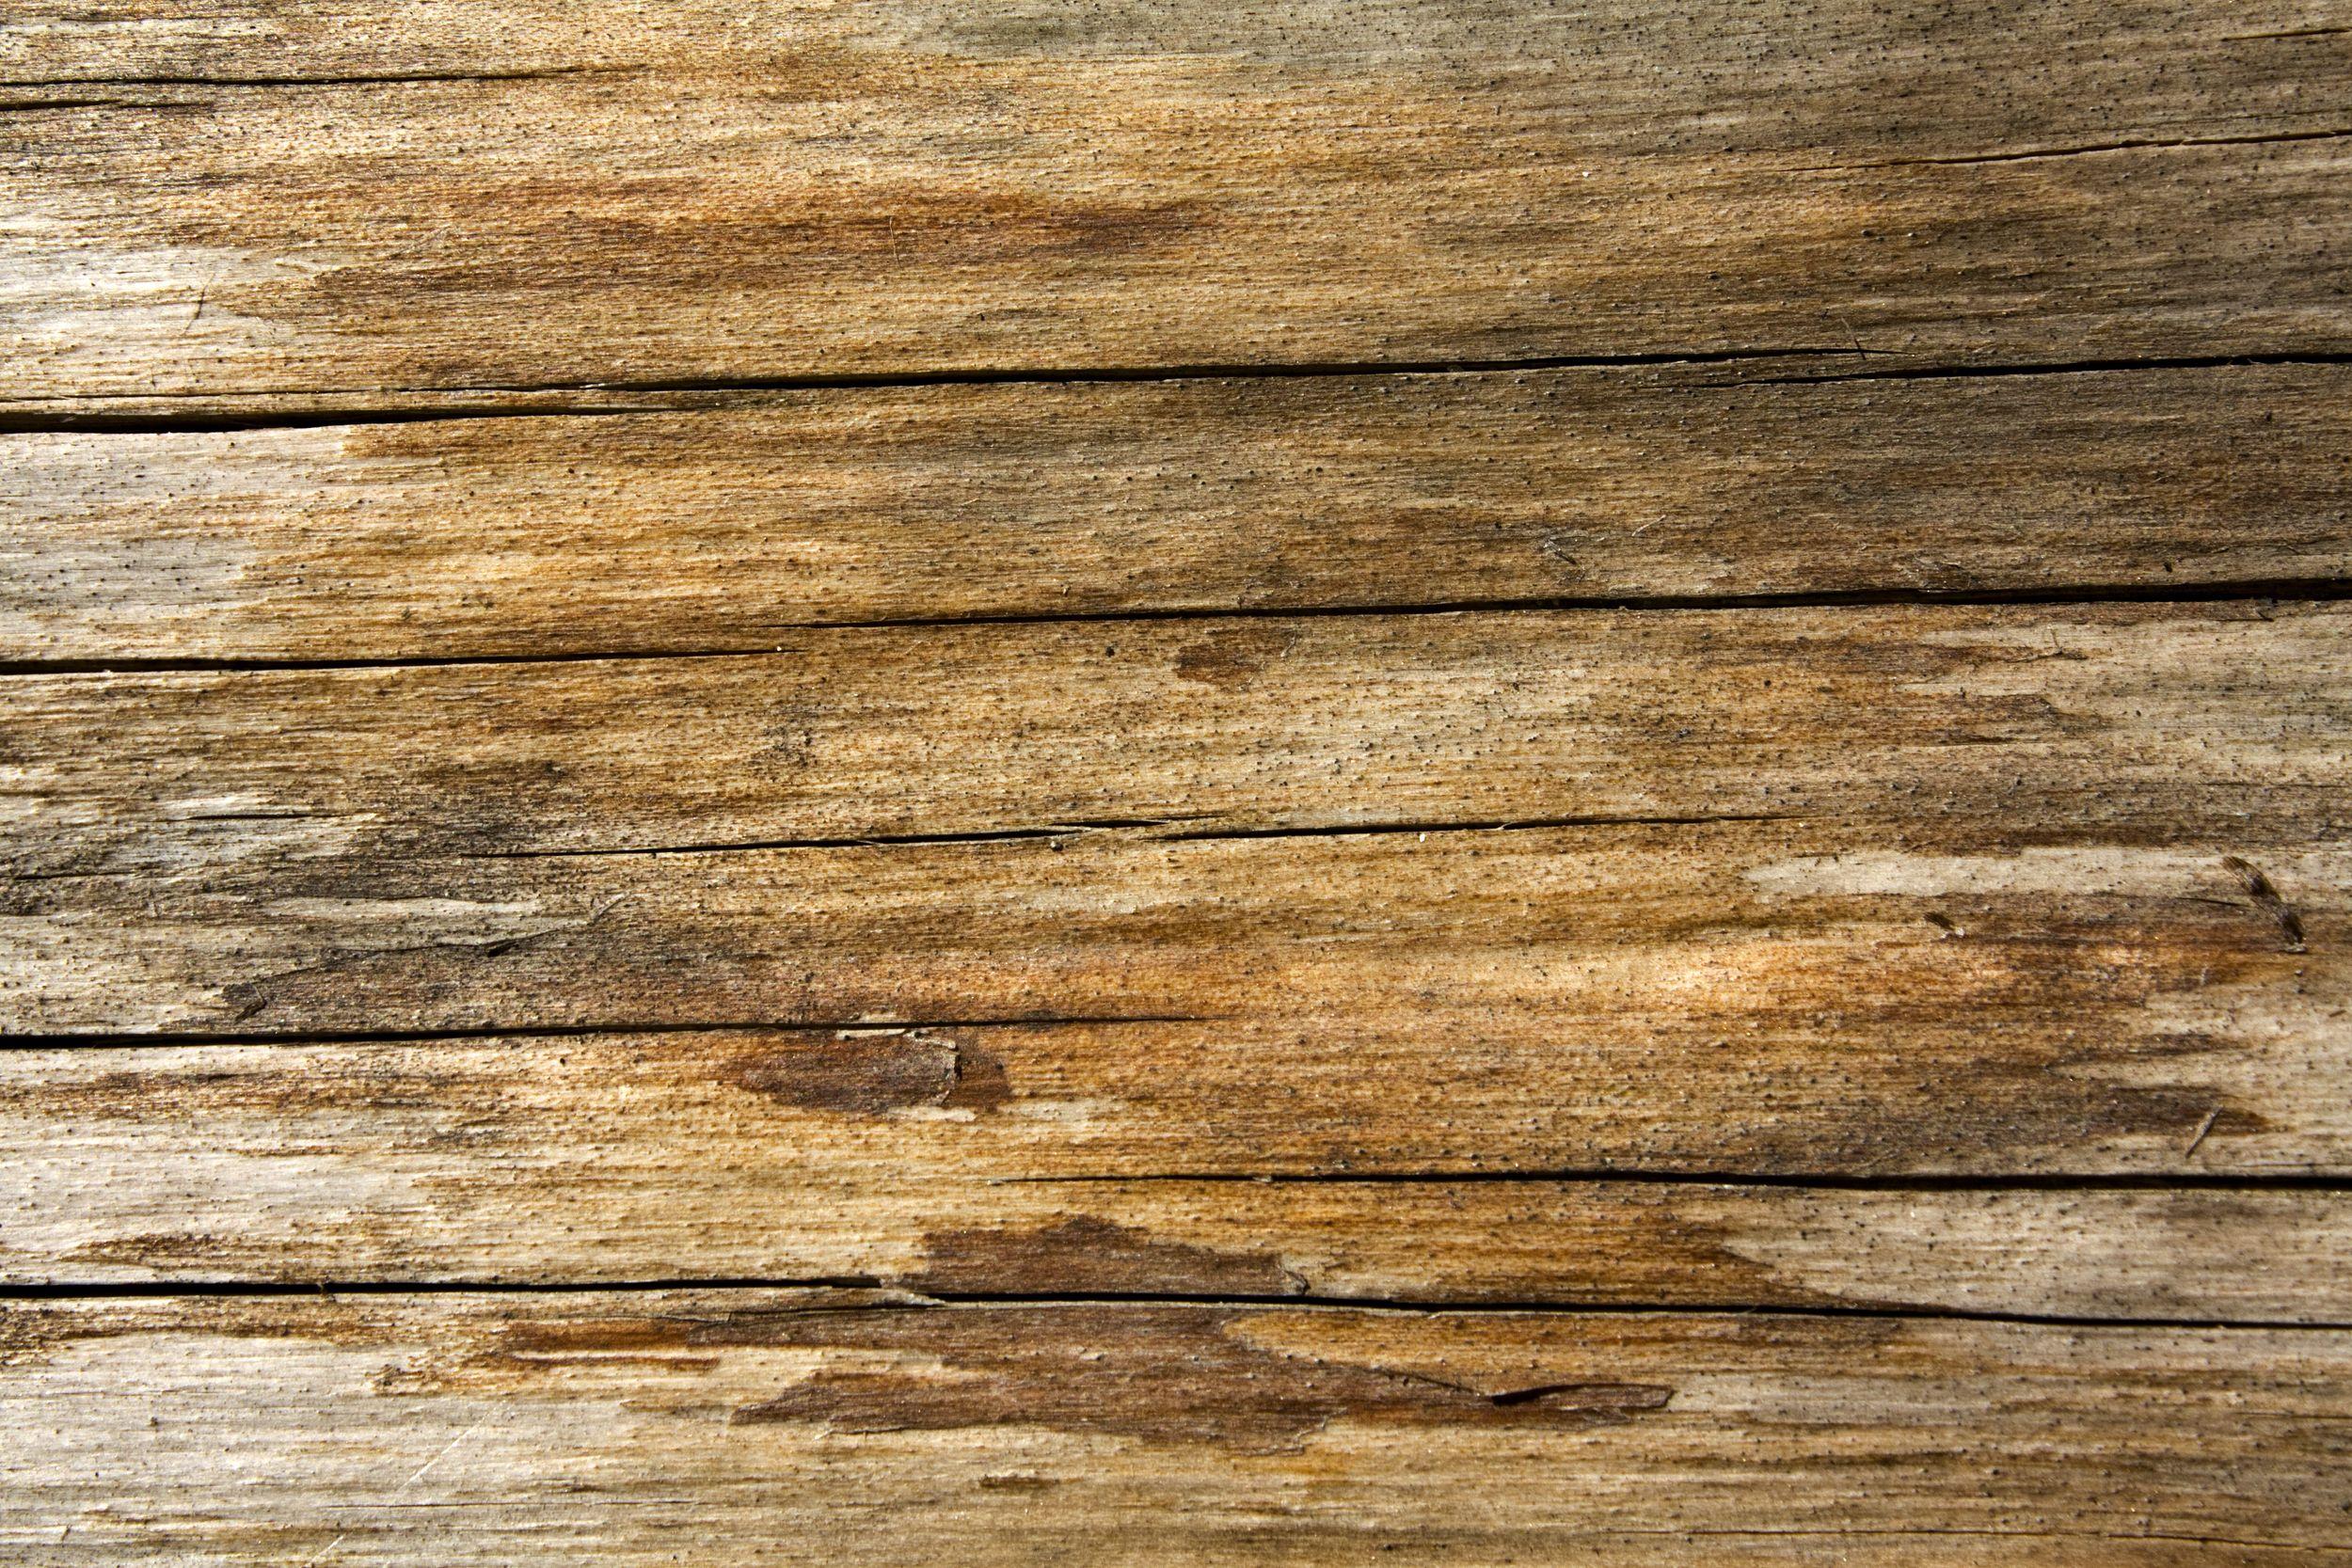 Varnish, Wall, Wood, Tables, 2500X1667